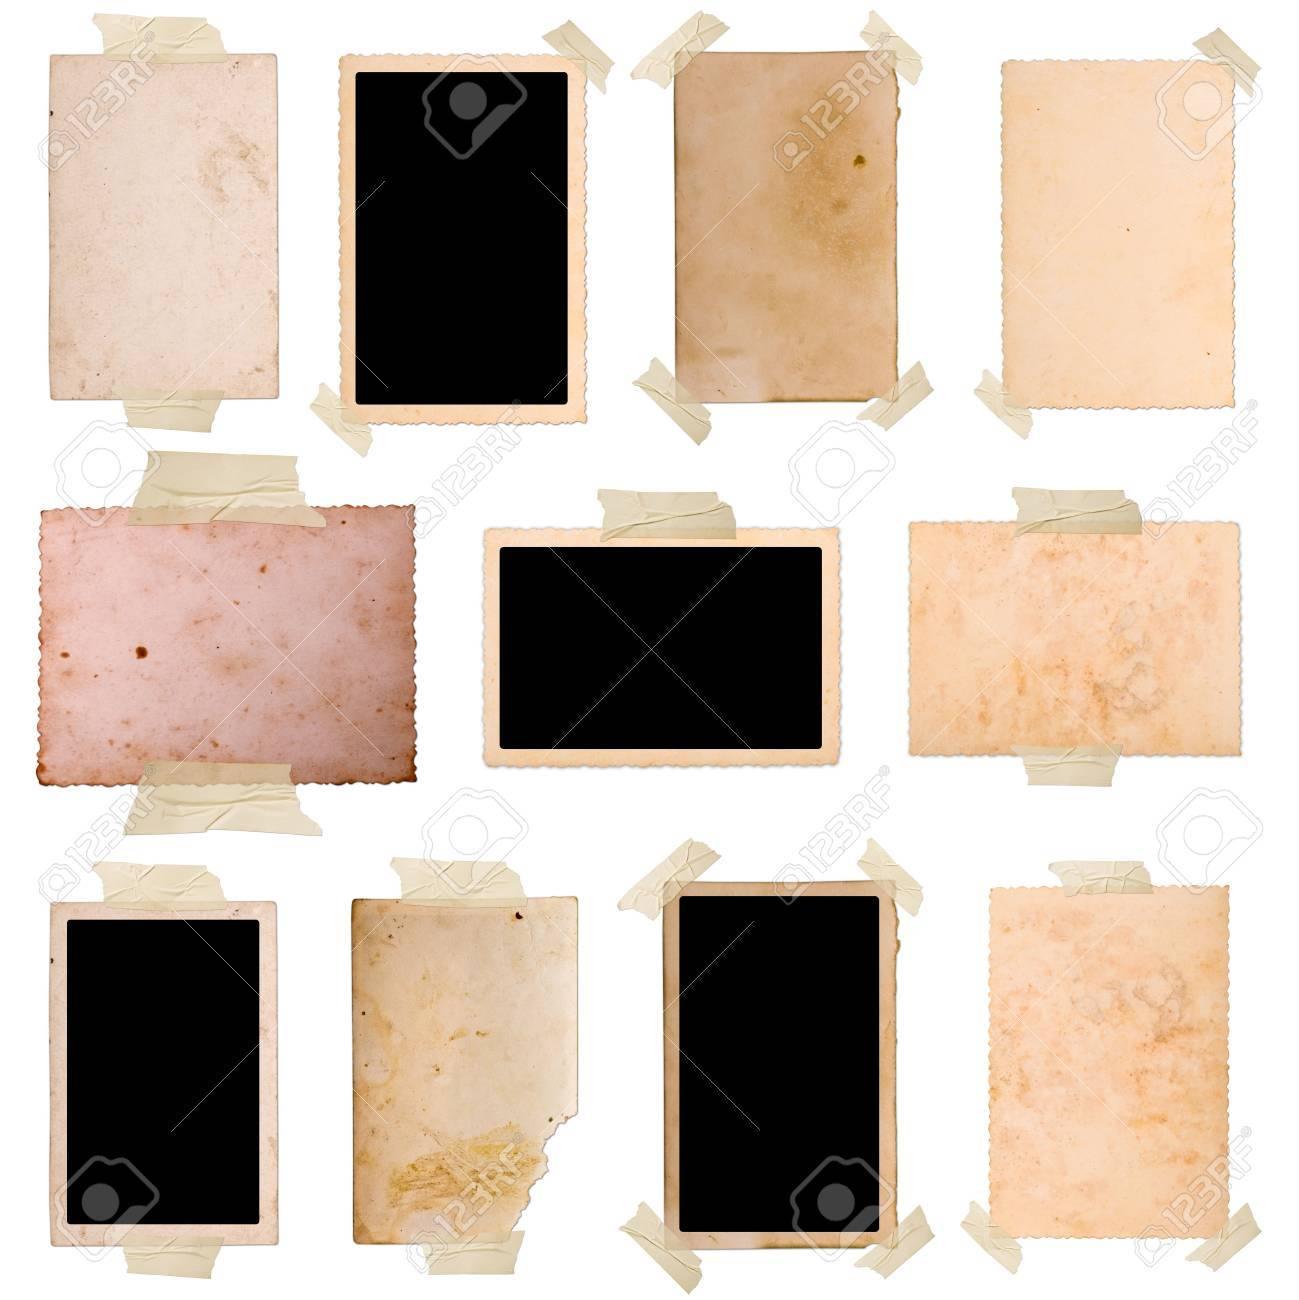 Vintage photo frames set 9, big collection Stock Photo - 7478253